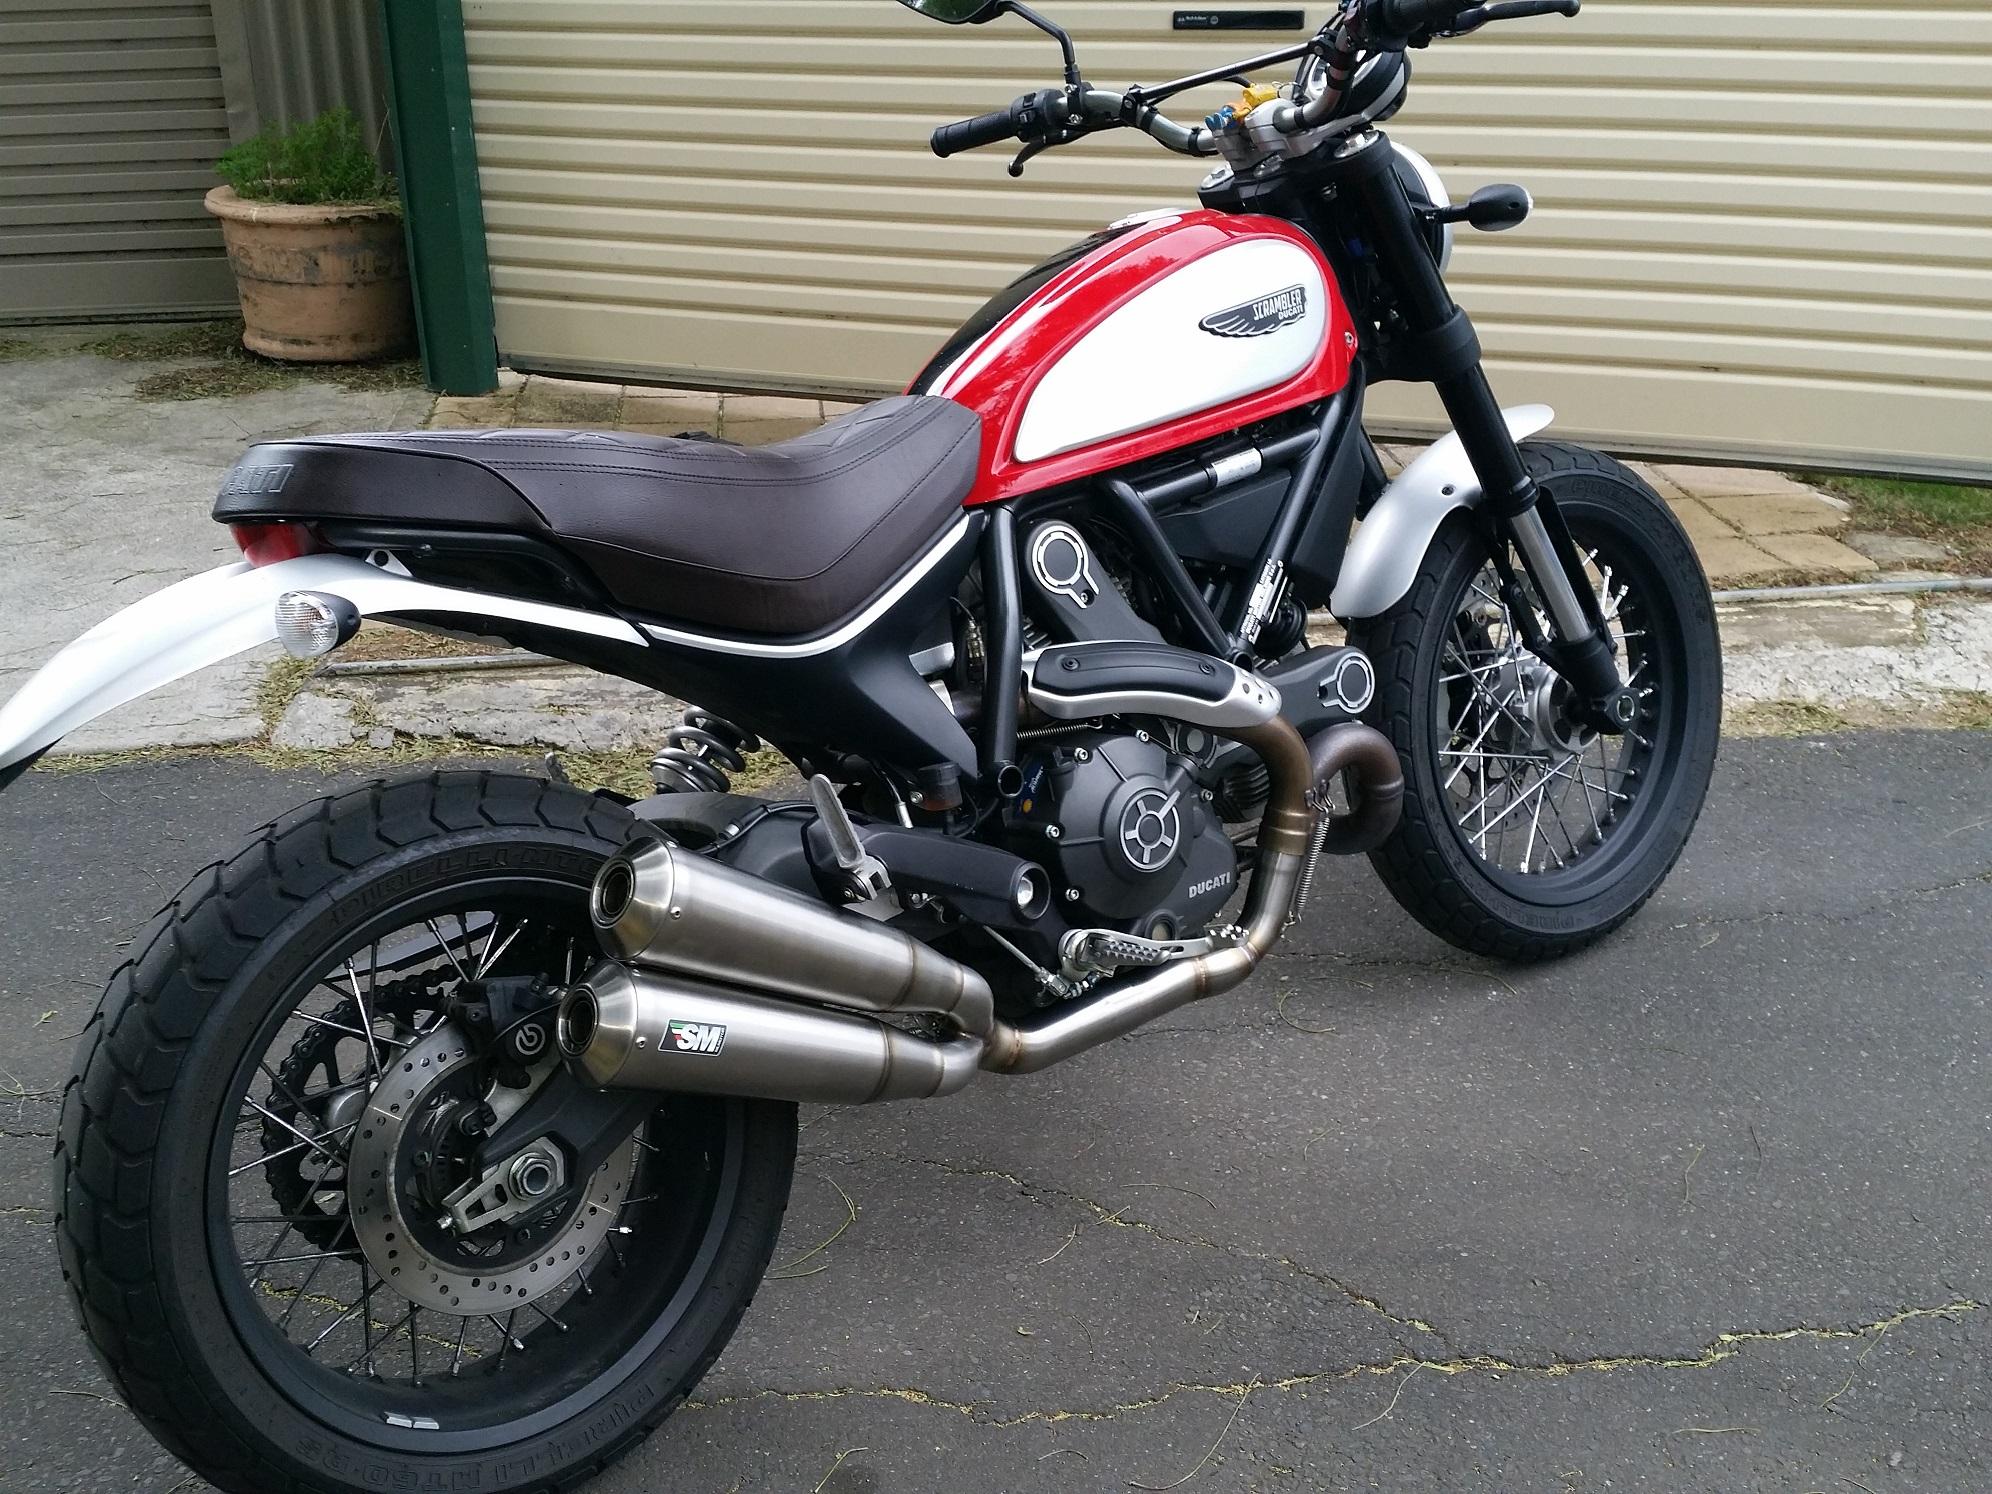 ducati scrambler 800 muffler silmotor torque power motorcycles. Black Bedroom Furniture Sets. Home Design Ideas